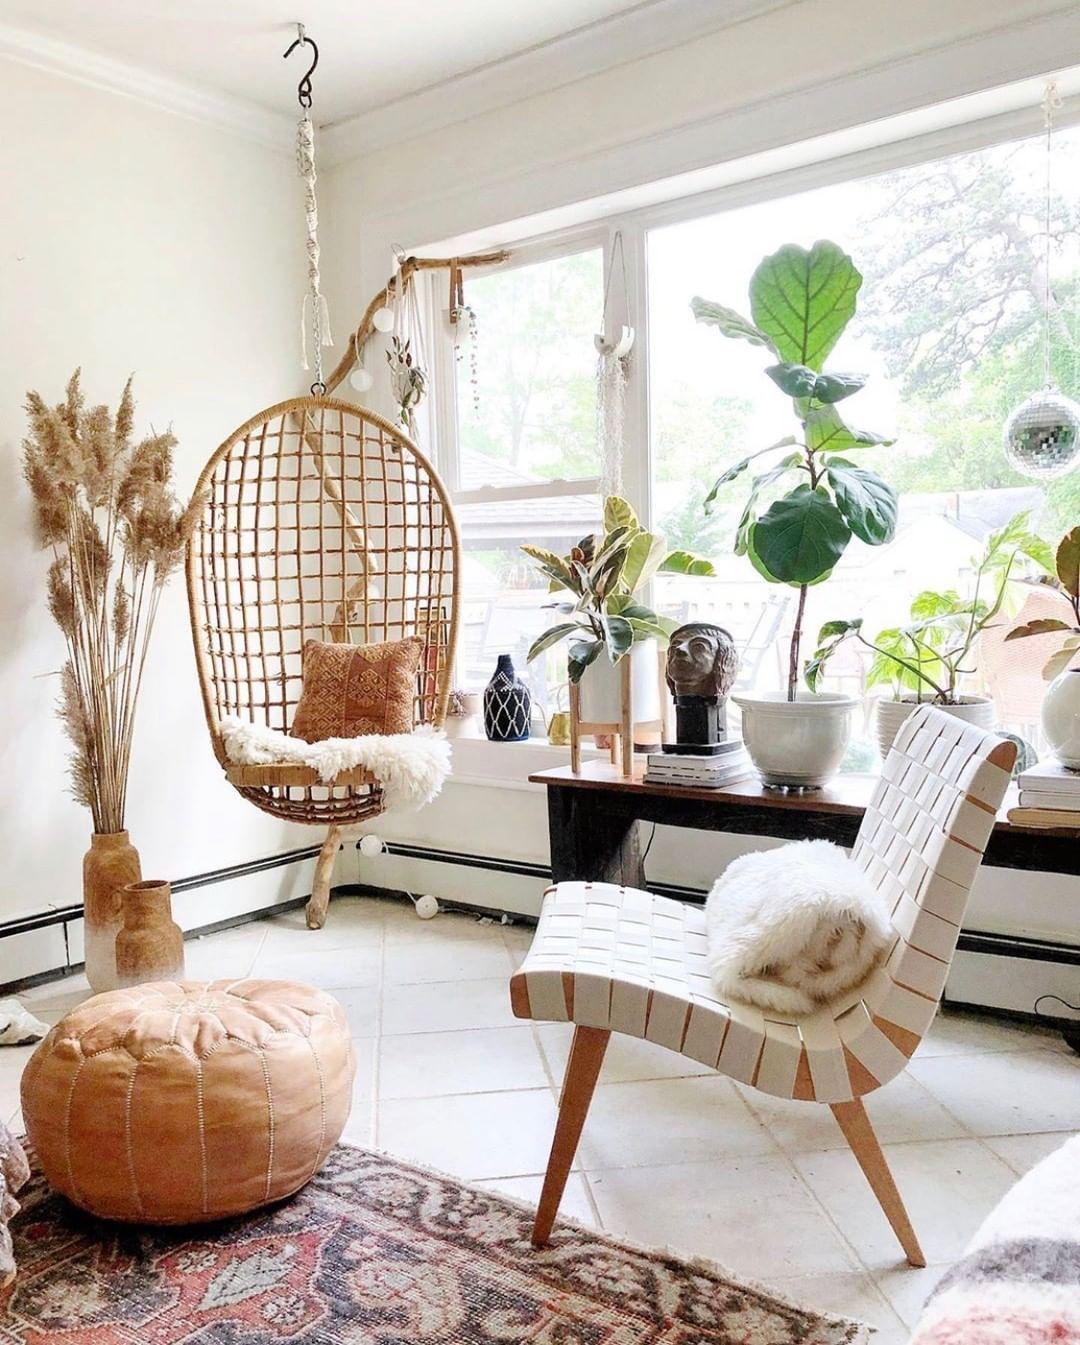 Risom Lounge Chair Hanging Chair Living Room Boho Living Room Girl Bedroom Decor